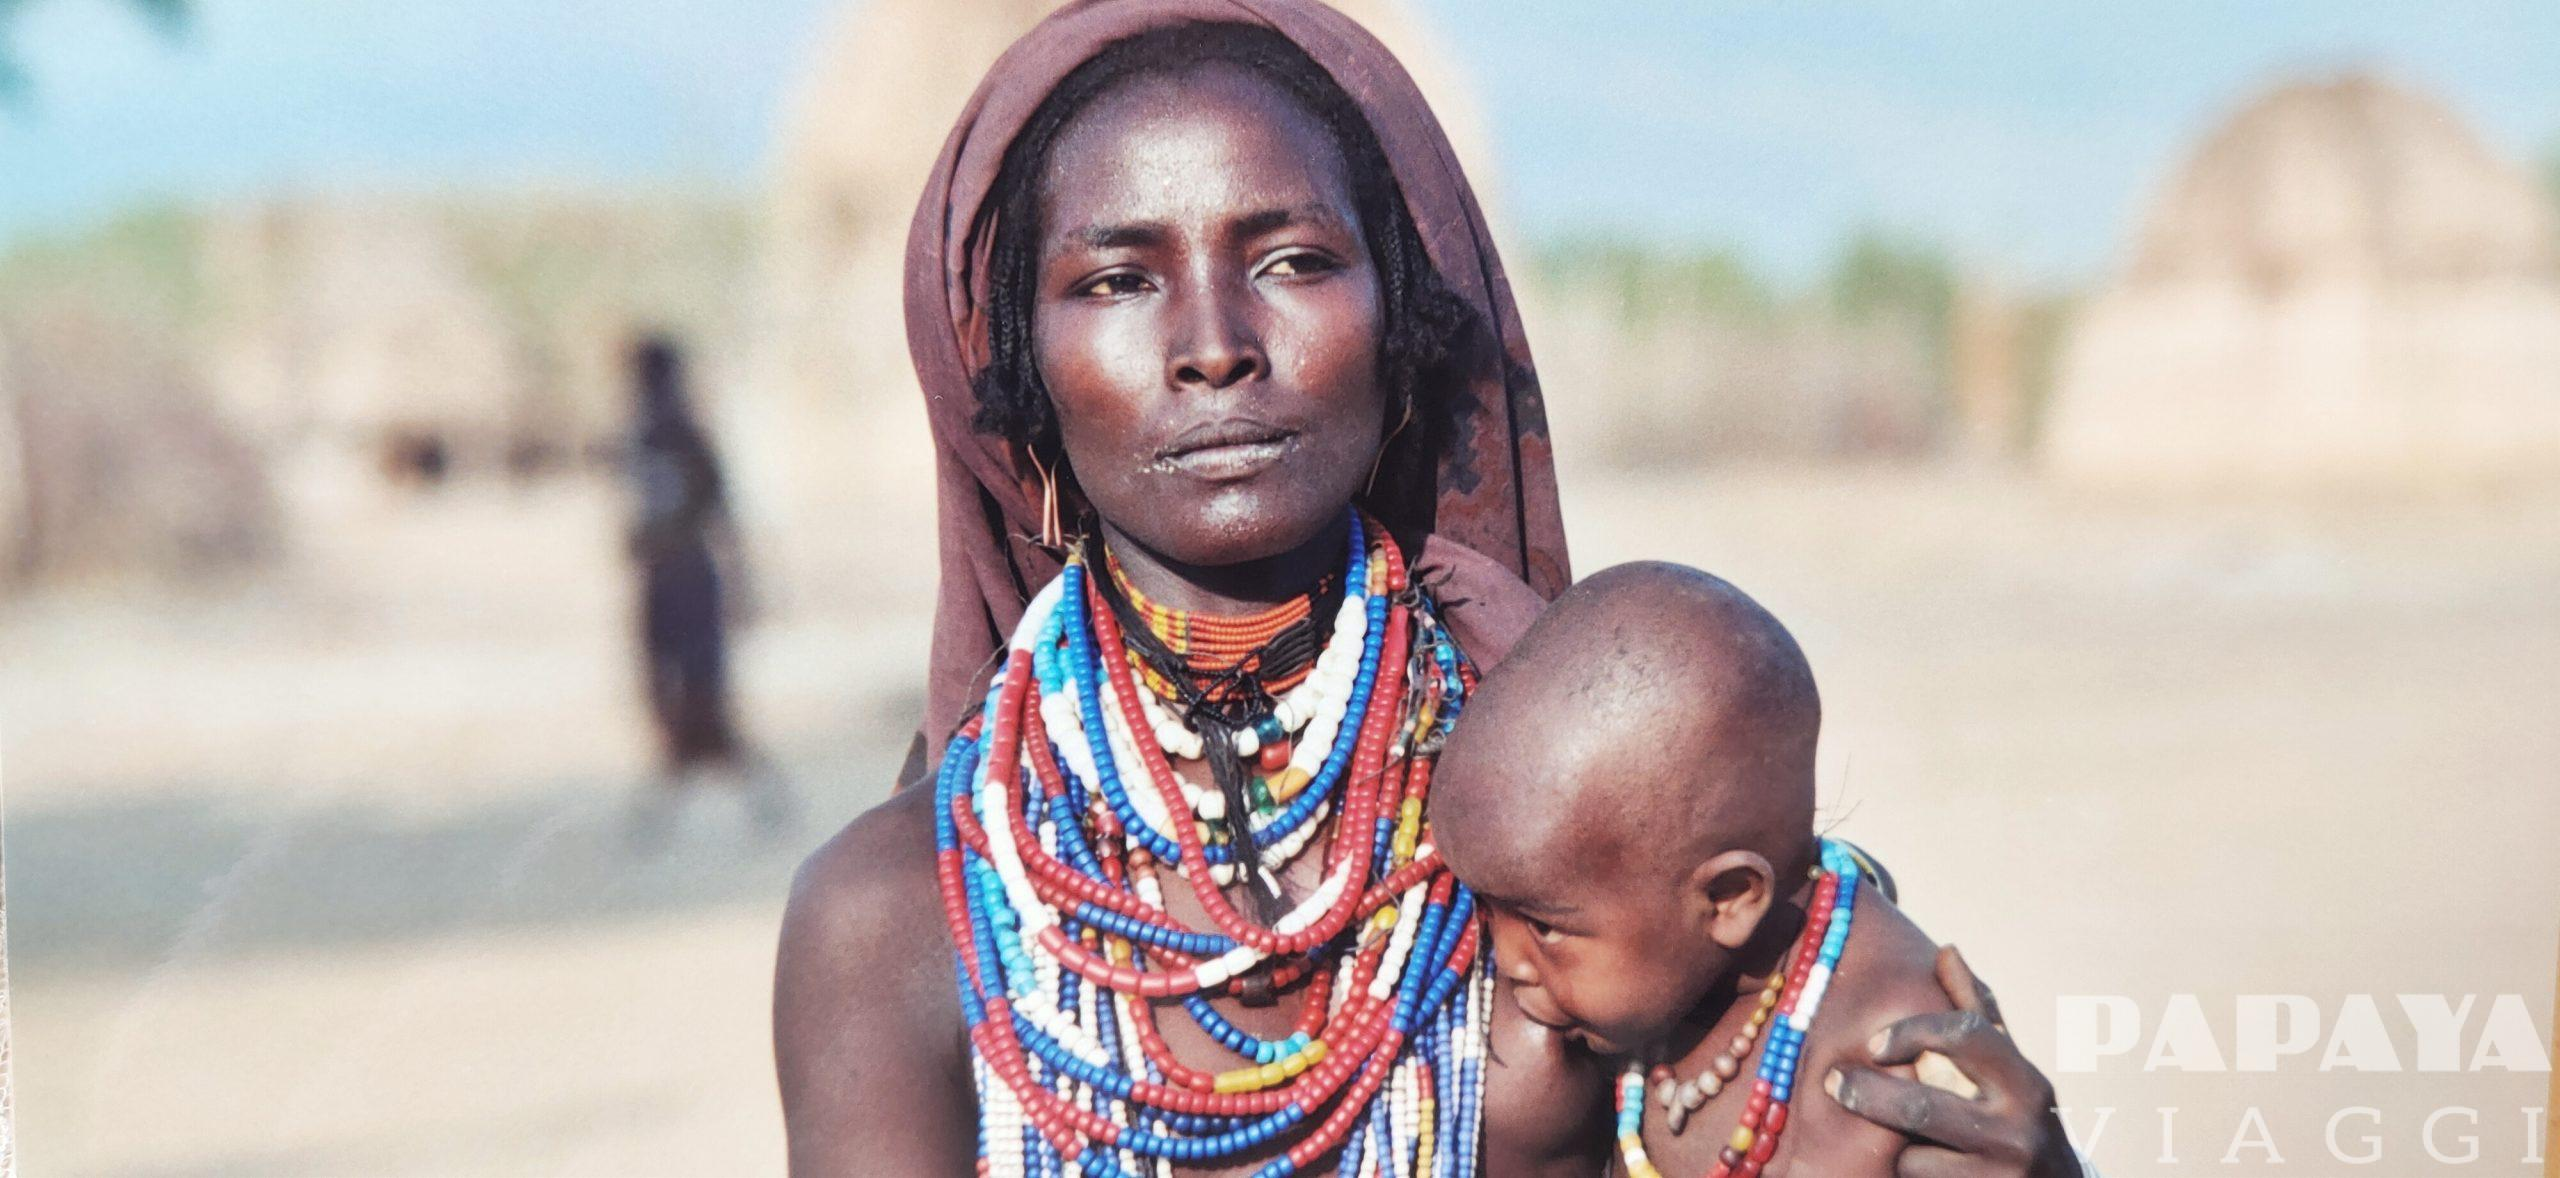 Etiopia, popoli e paesaggi